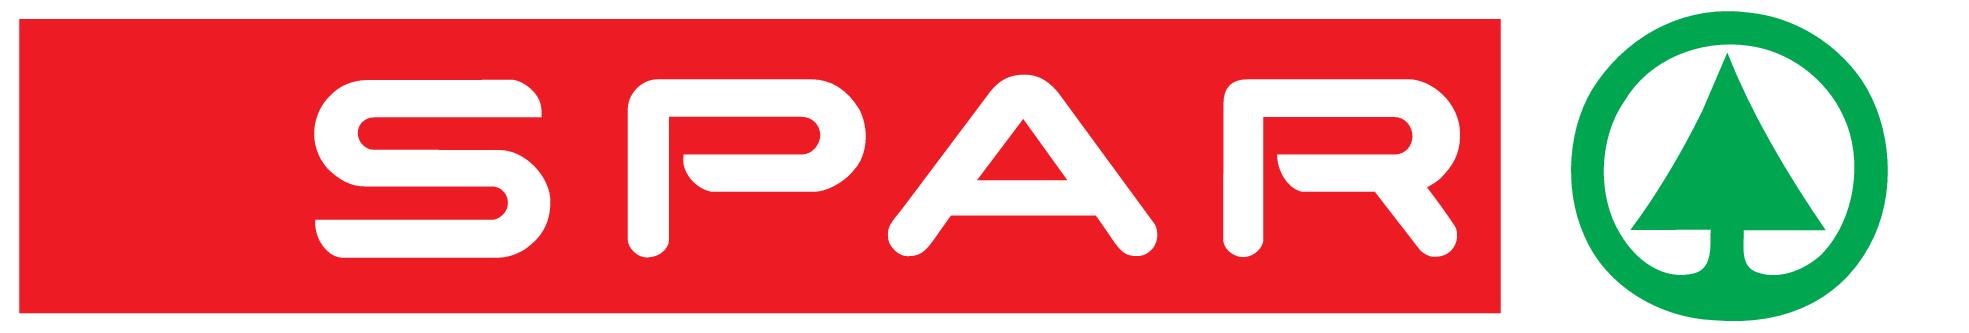 spar-logo-4